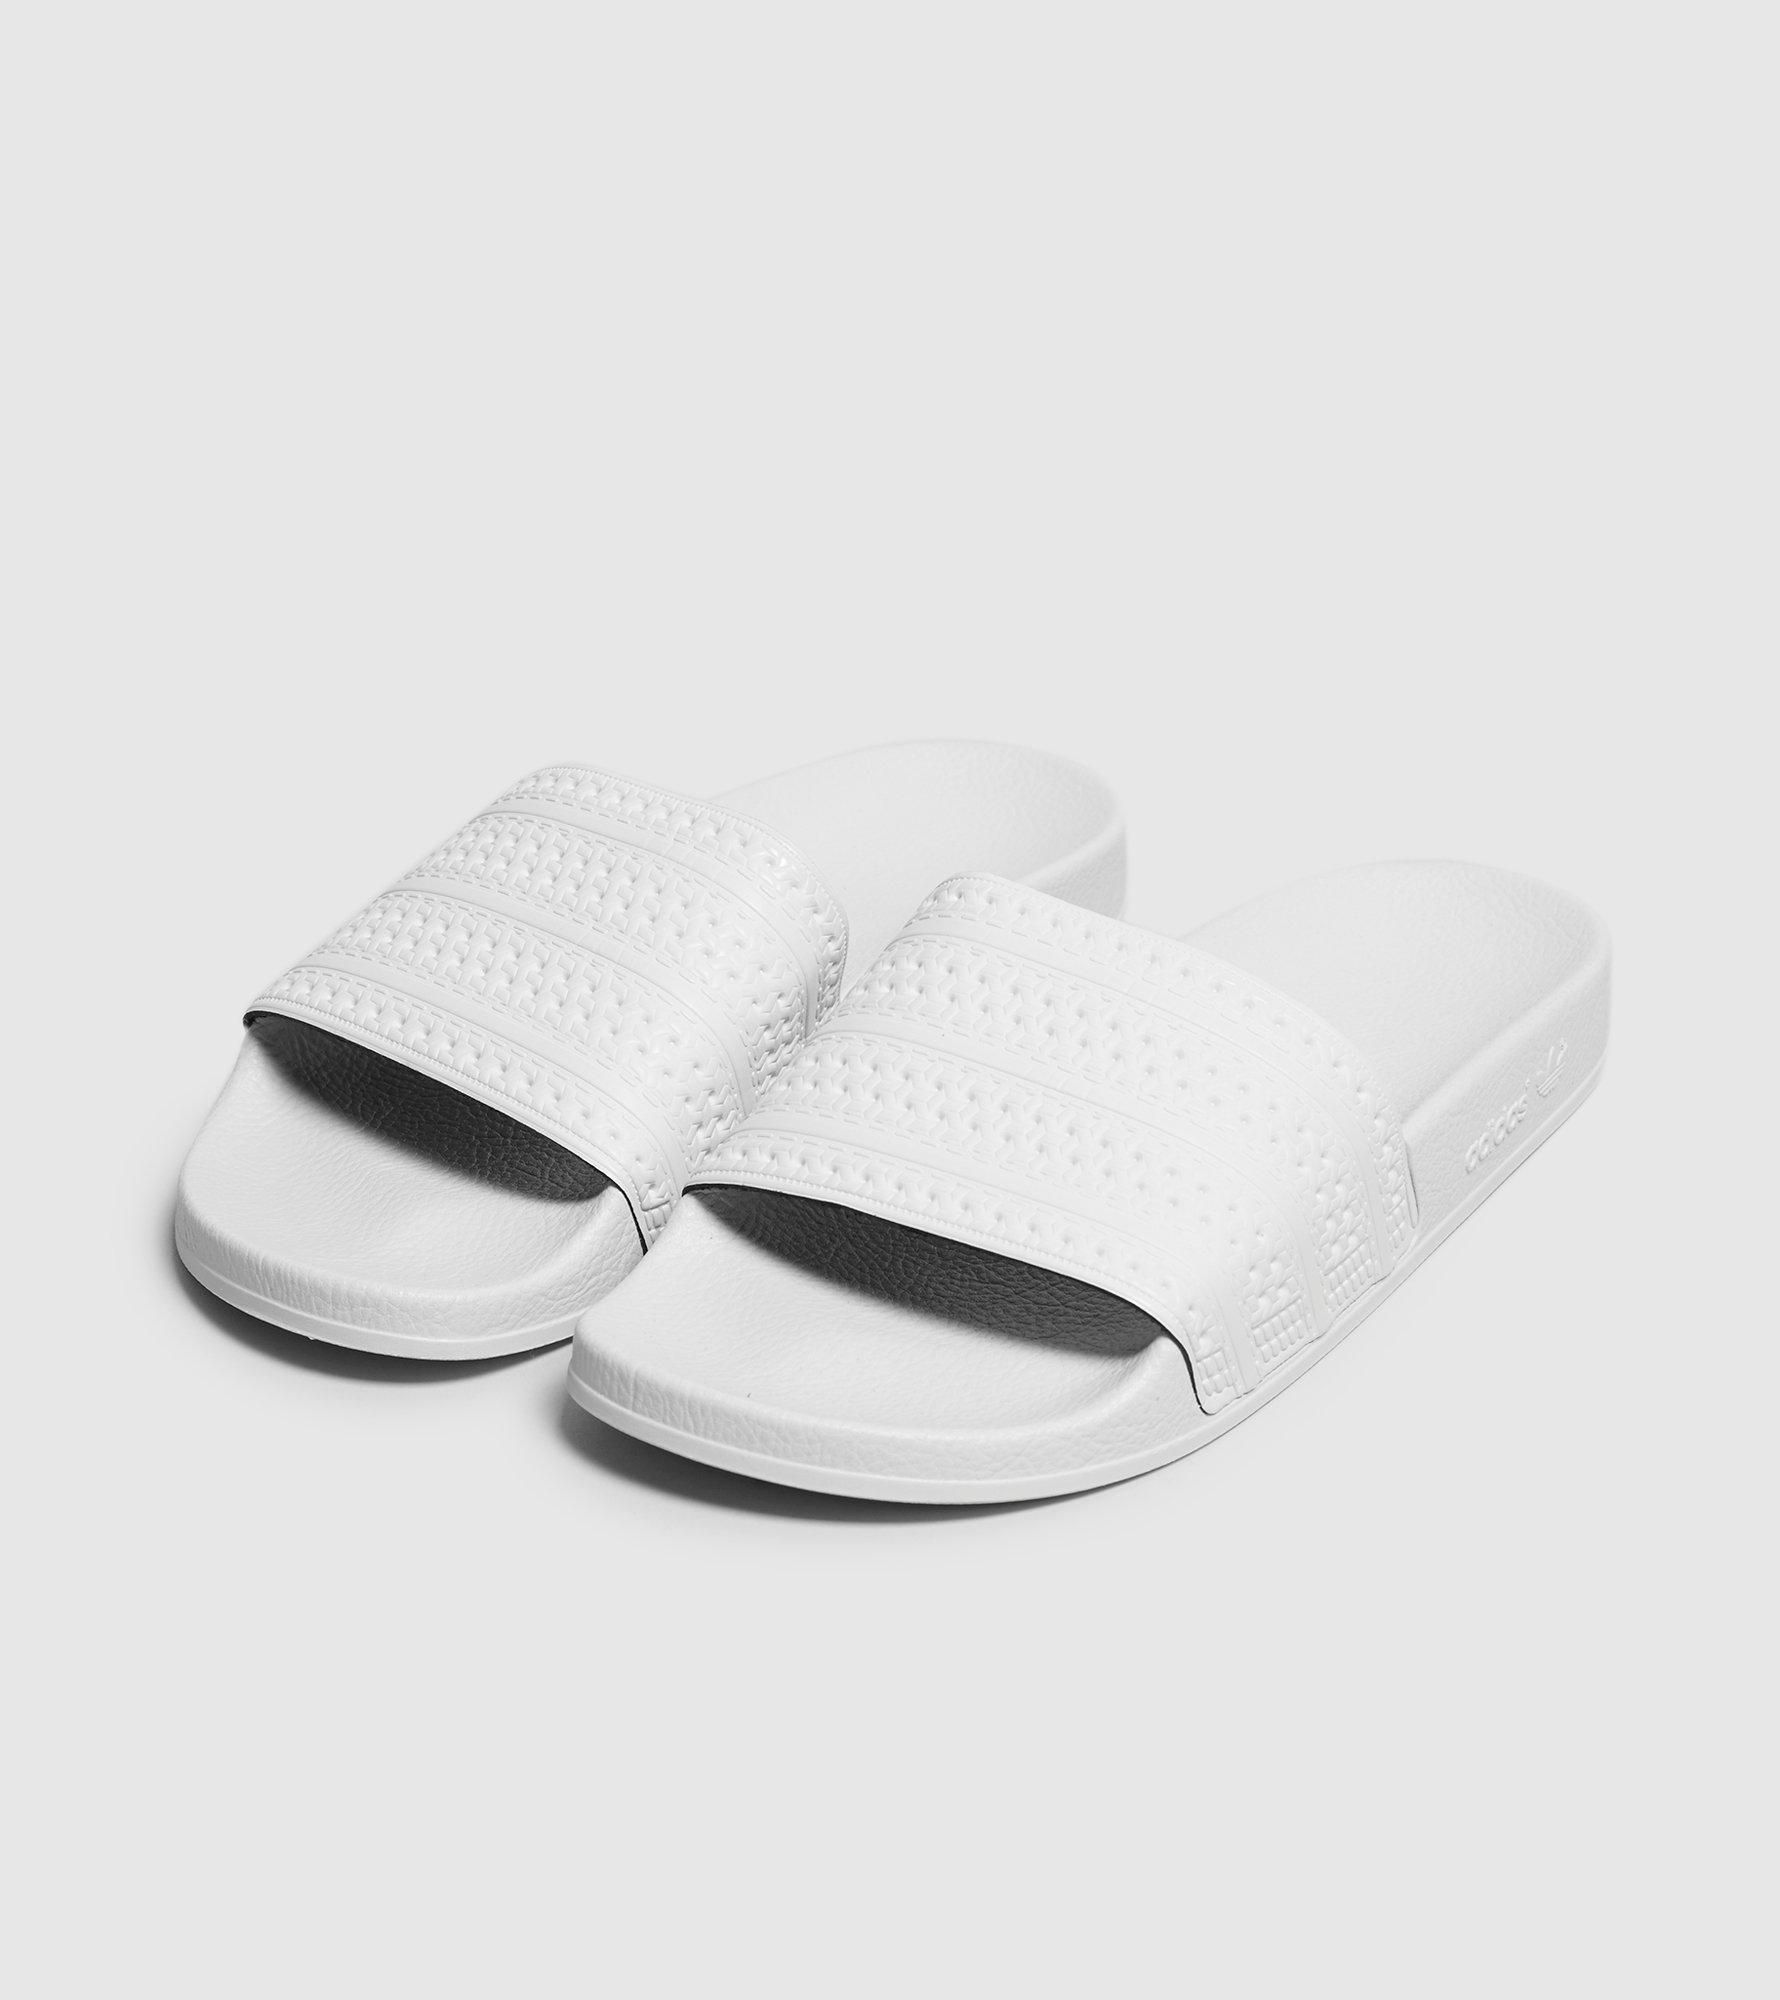 Lyst - adidas Originals Adilette Slides for Men 08b2d150f